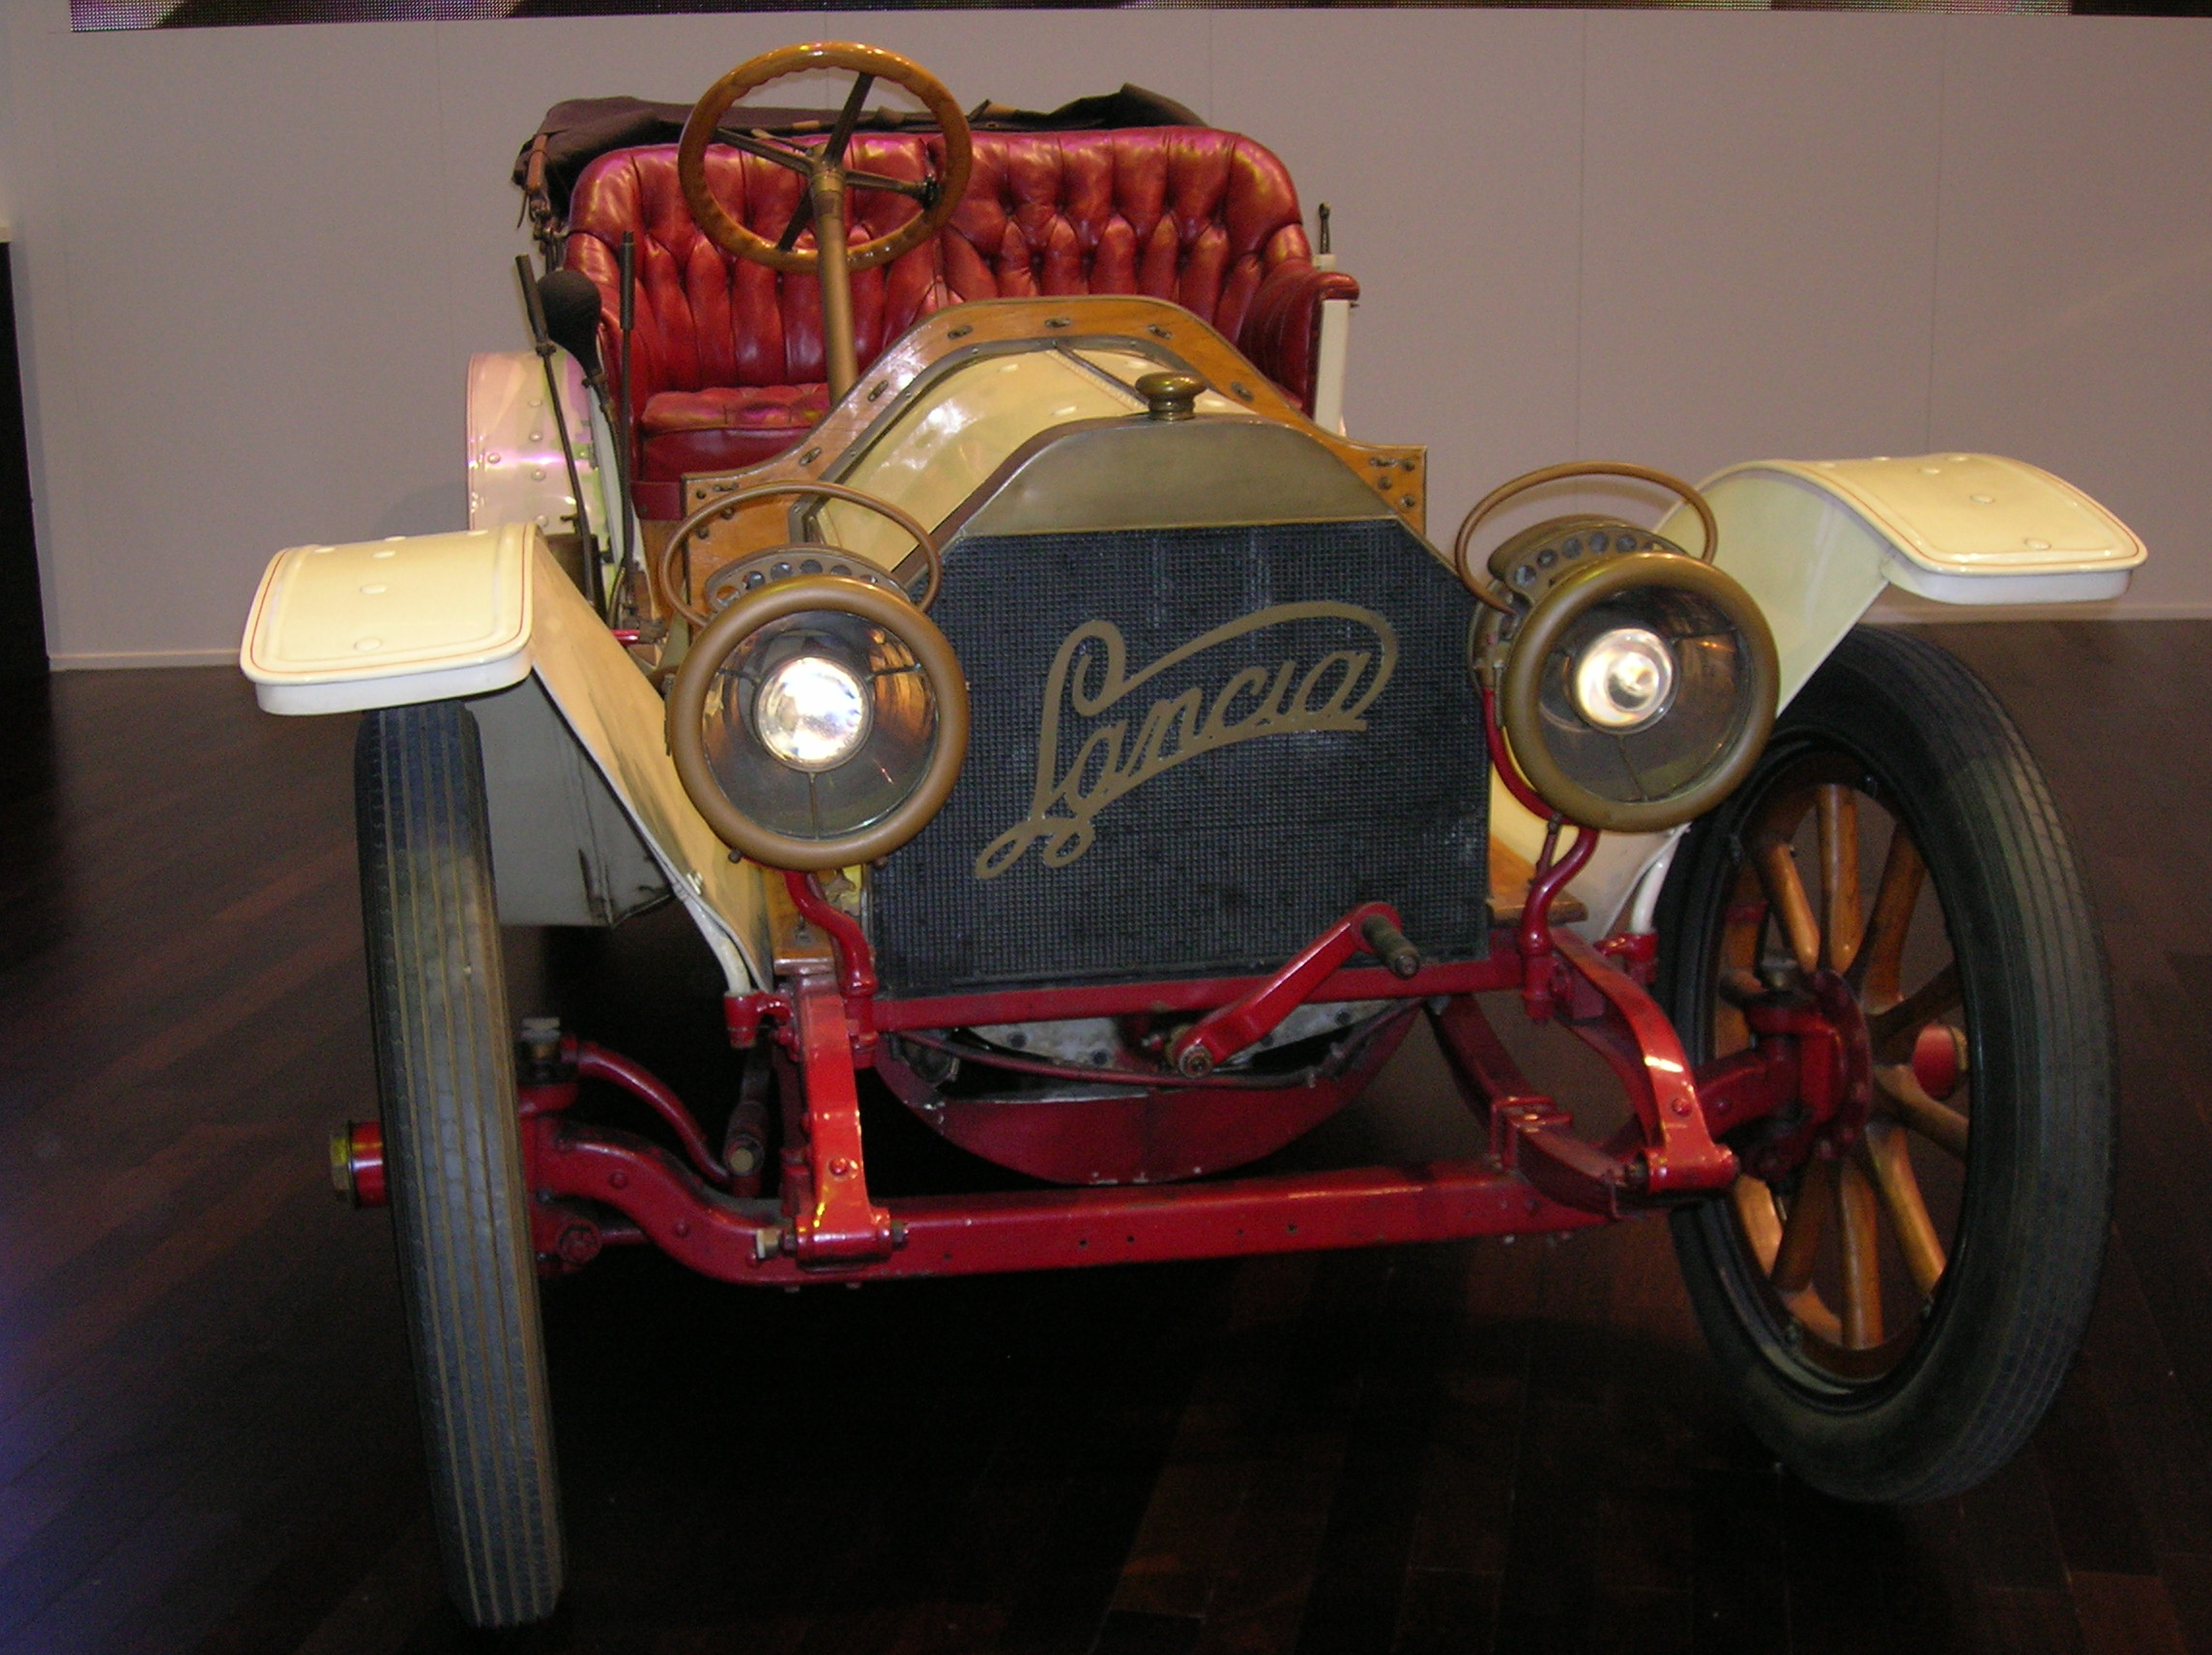 https://upload.wikimedia.org/wikipedia/commons/2/25/2006_SAG_-_Lancia_Beta_Torpedo_1520_HP_1909_-01.JPG